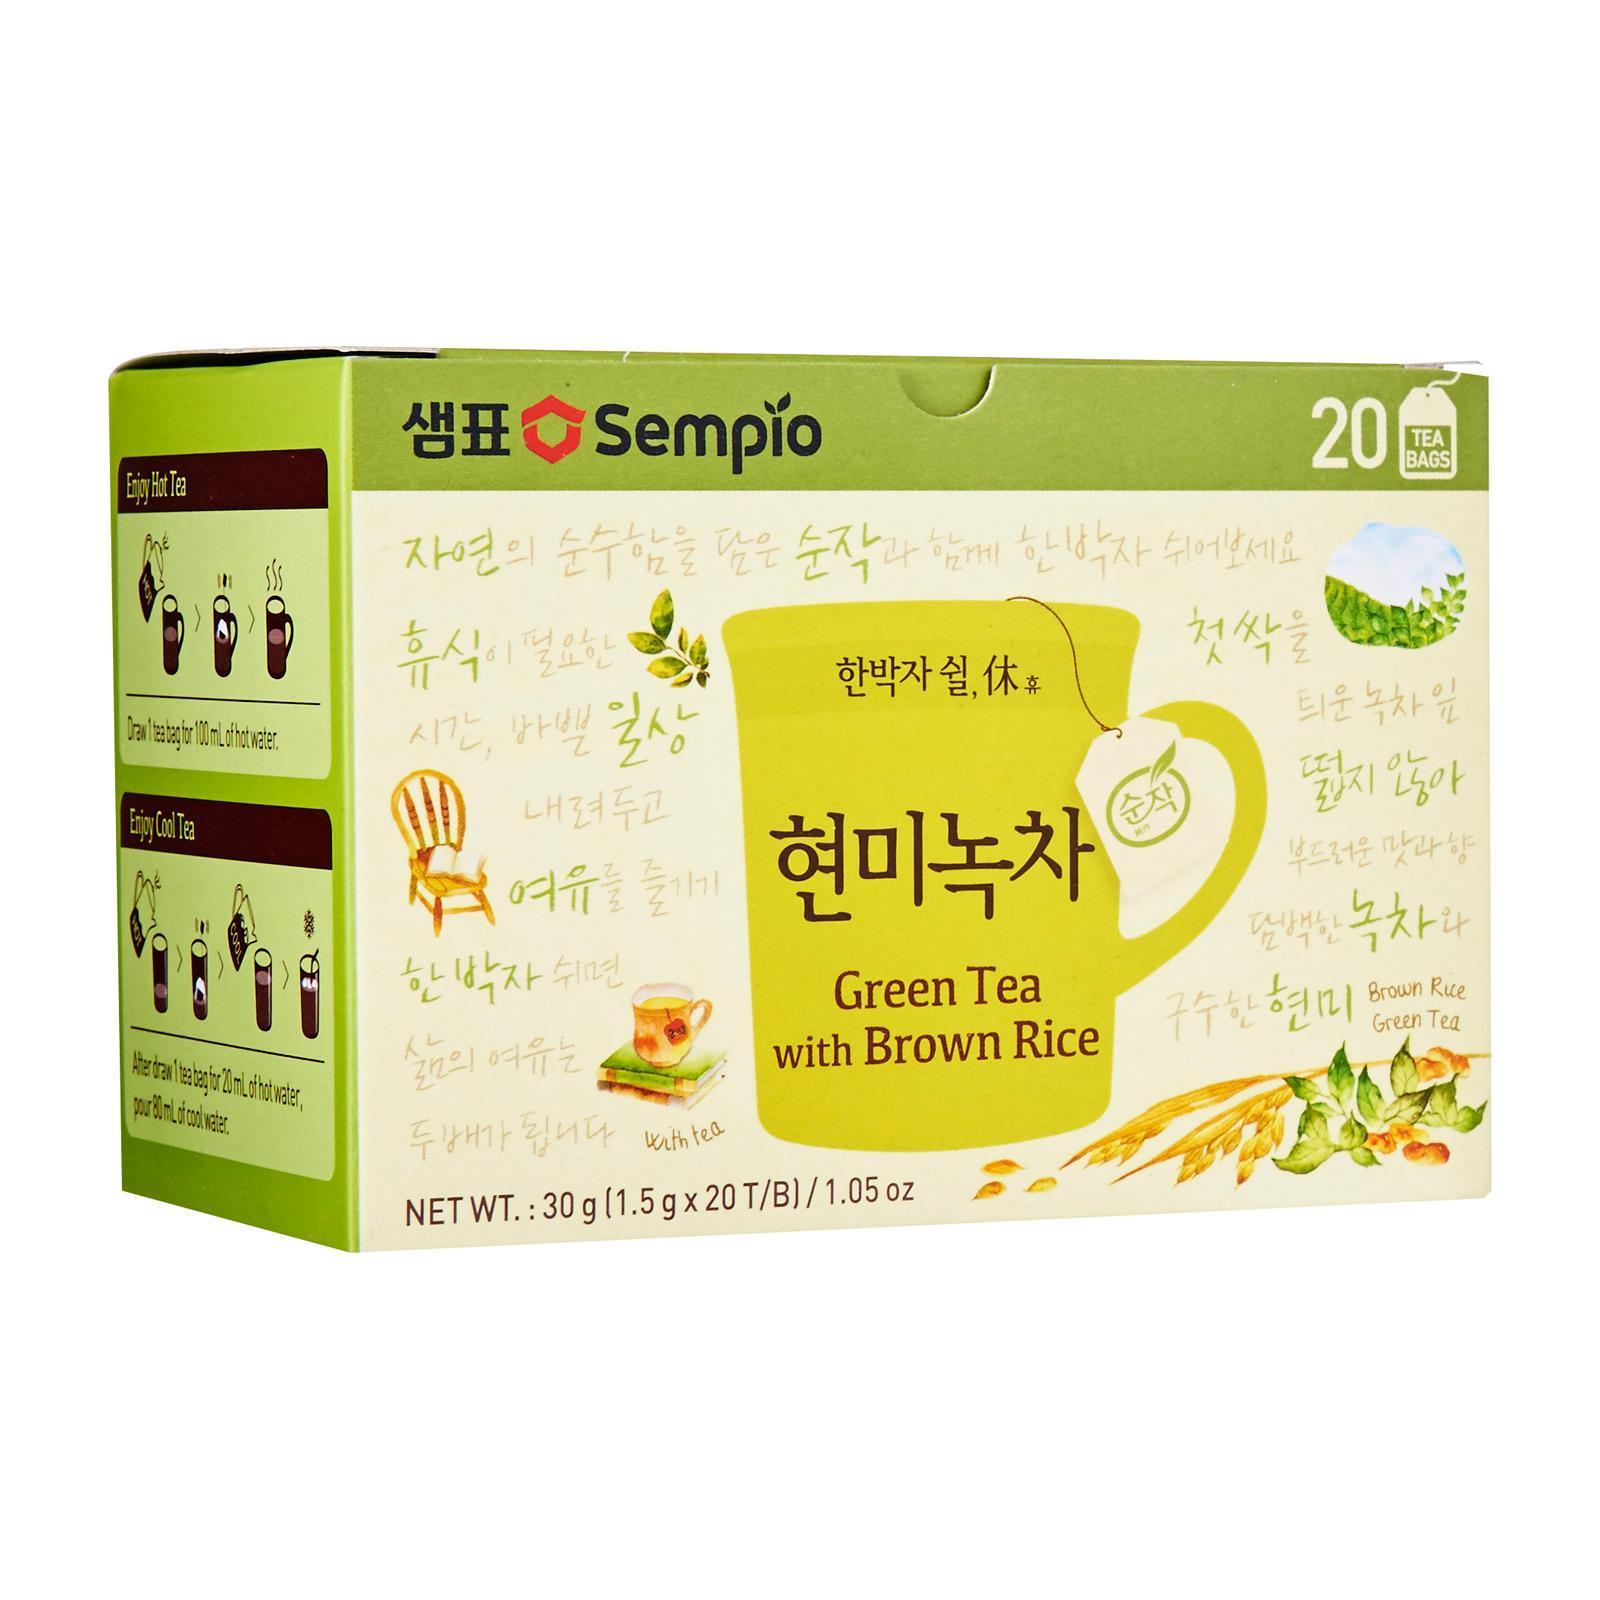 Sempio Green Tea With Brown Rice Tea Bags